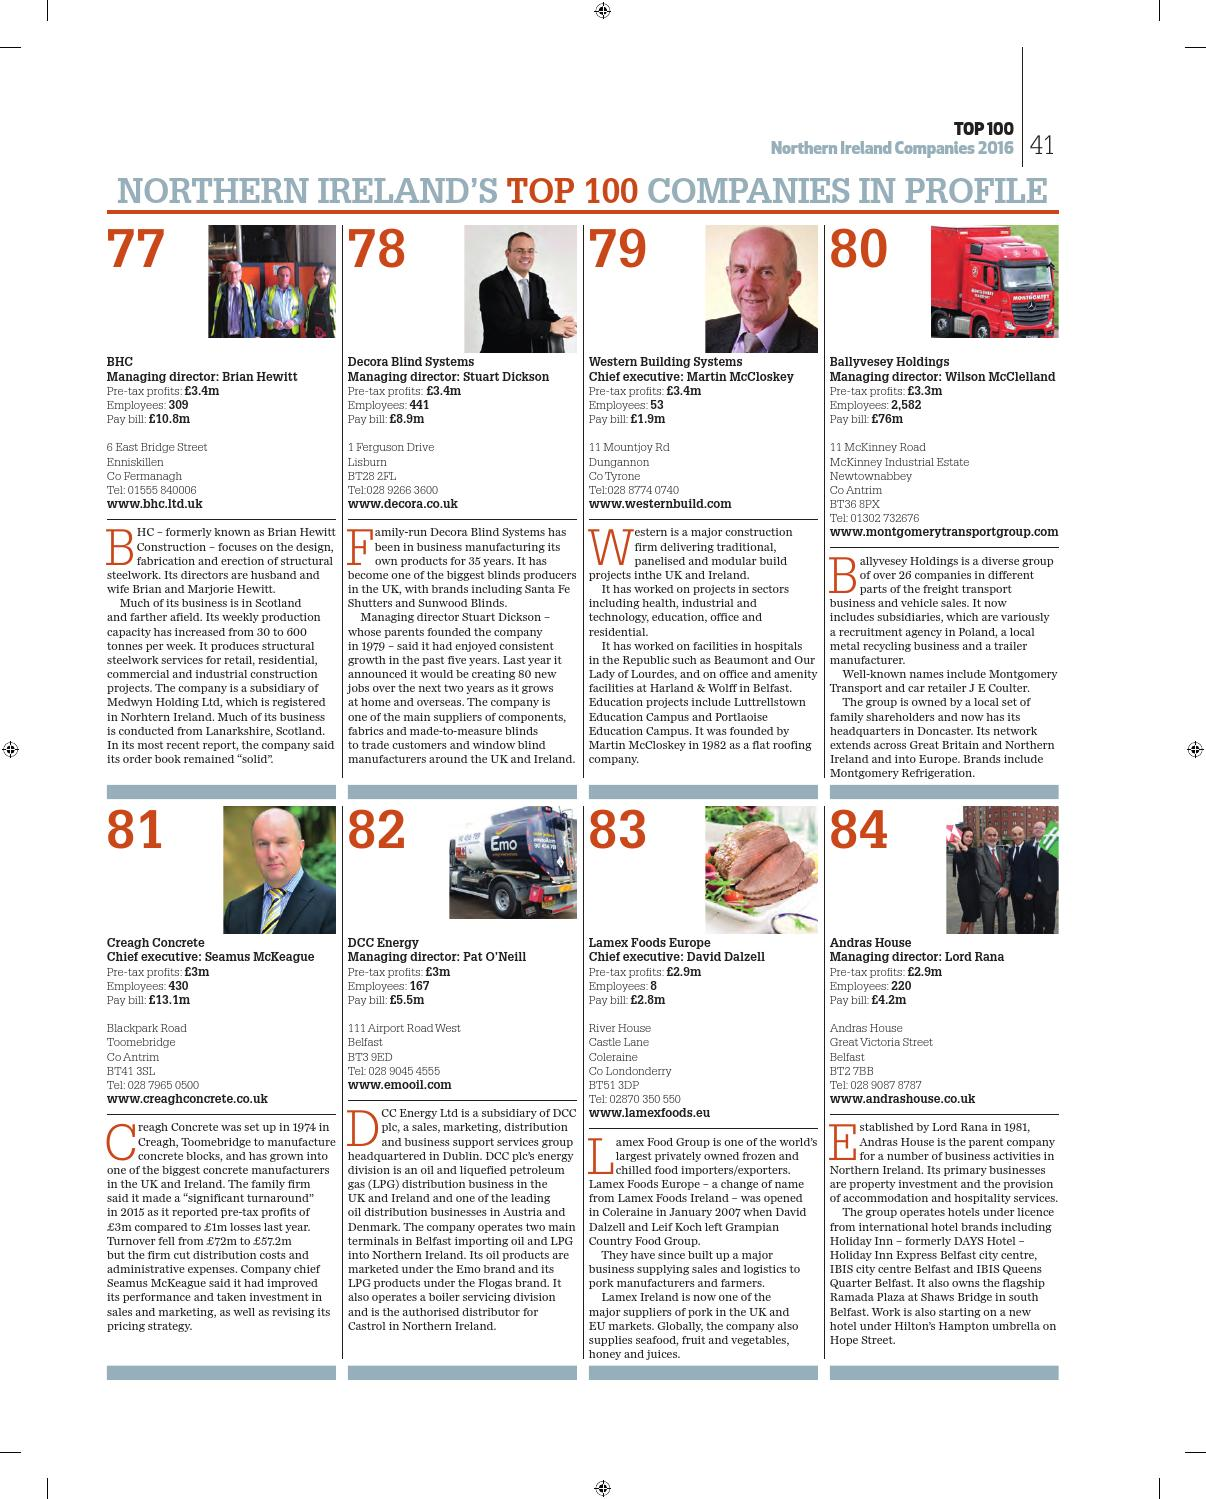 Belfast Telegraph Top 100 Northern Ireland Companies by